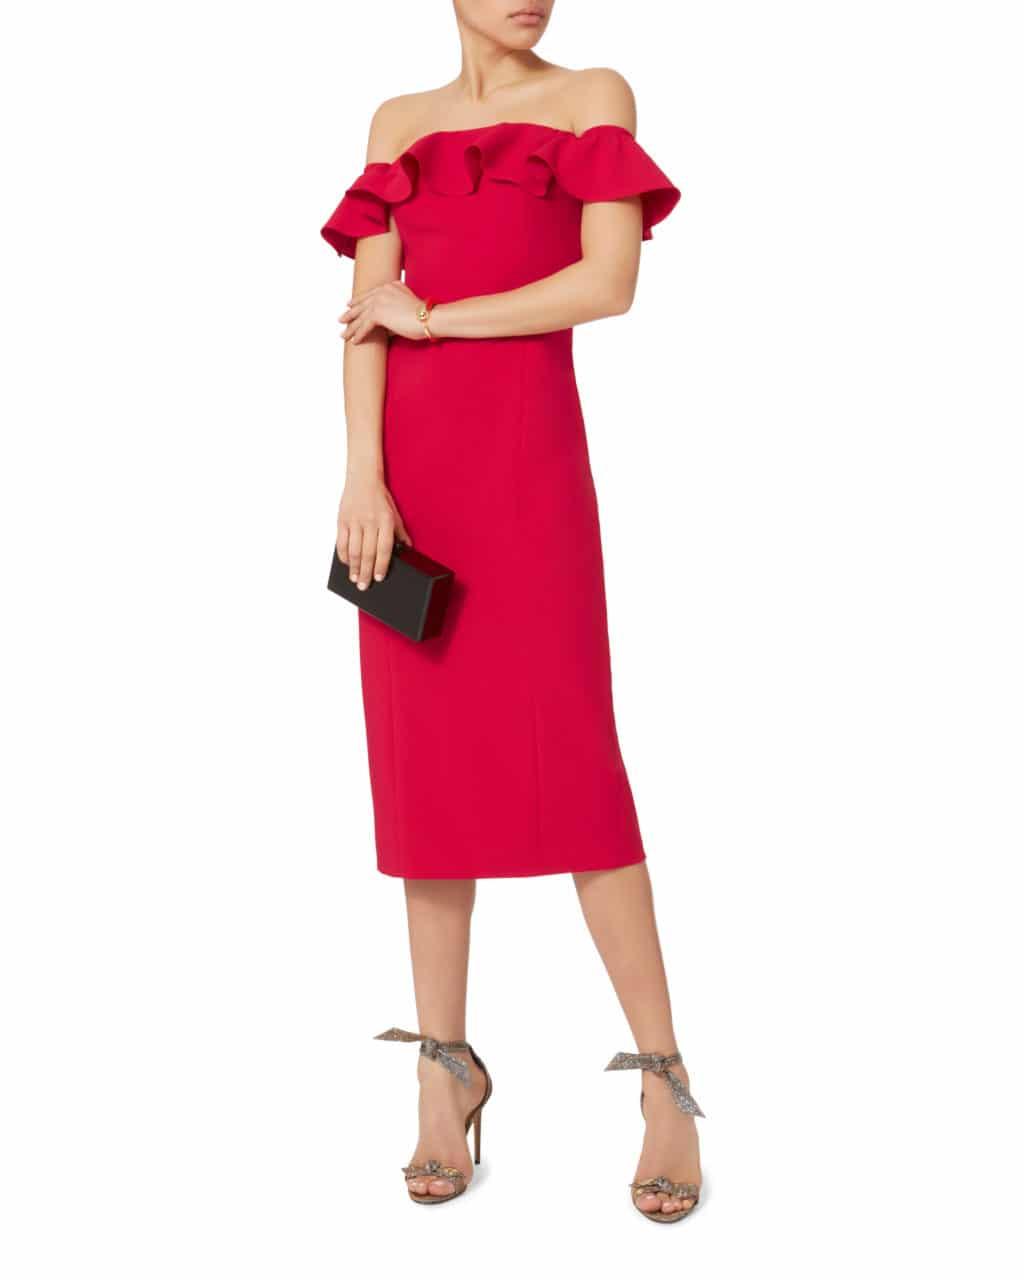 JAY GODFREY Rollins Ruffle Red Dress